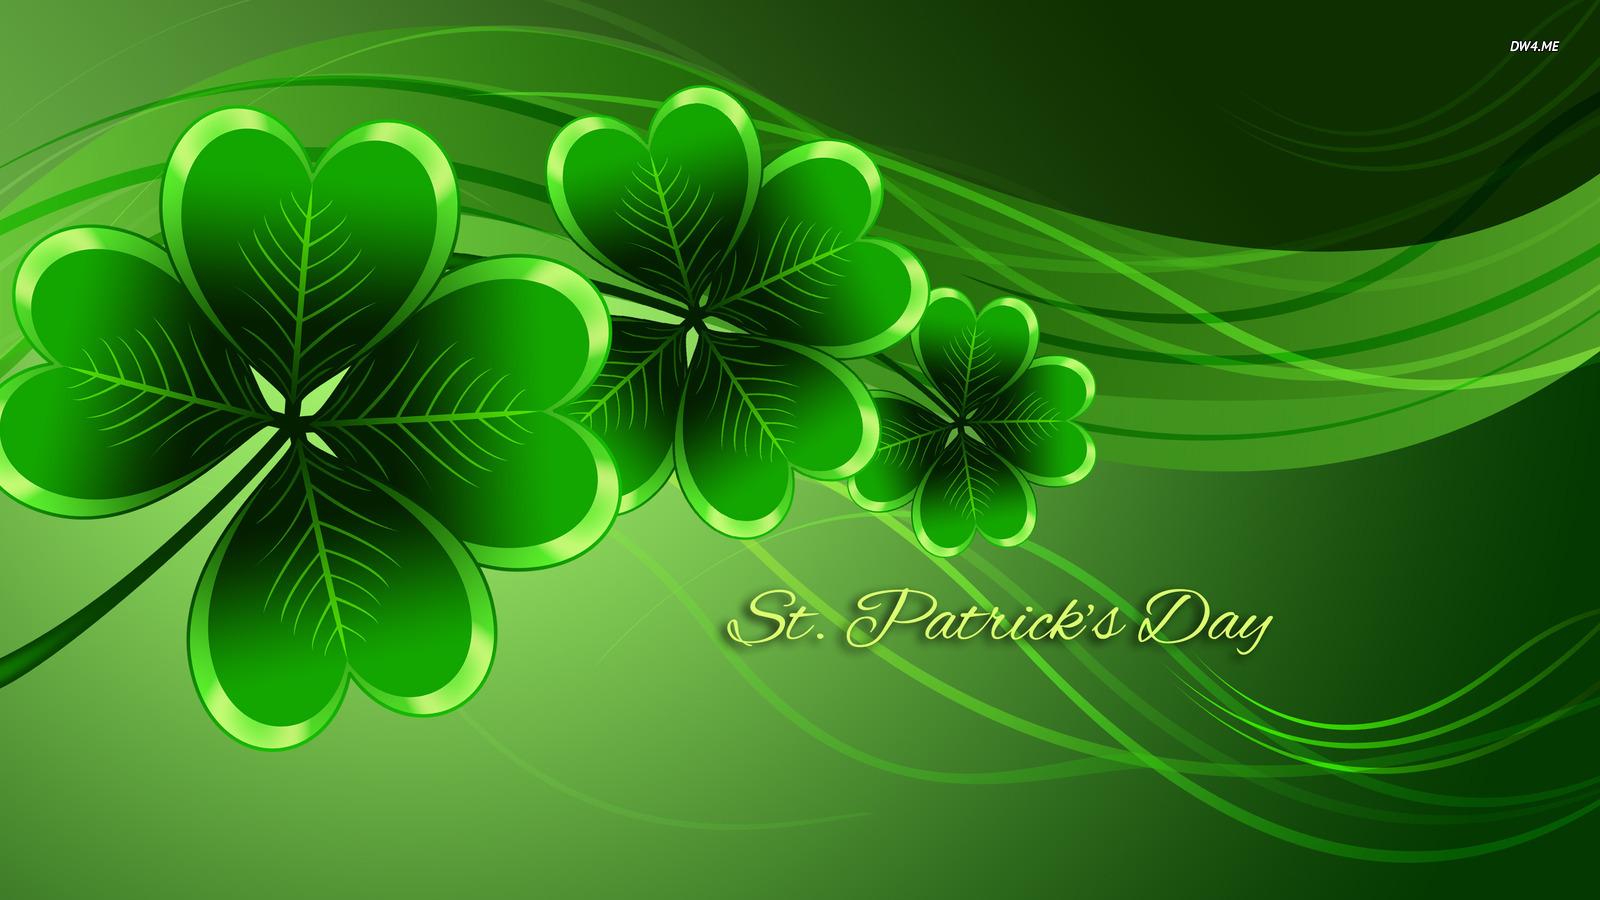 Saint Patrick's Day wallpaper - Holiday wallpapers - #2159